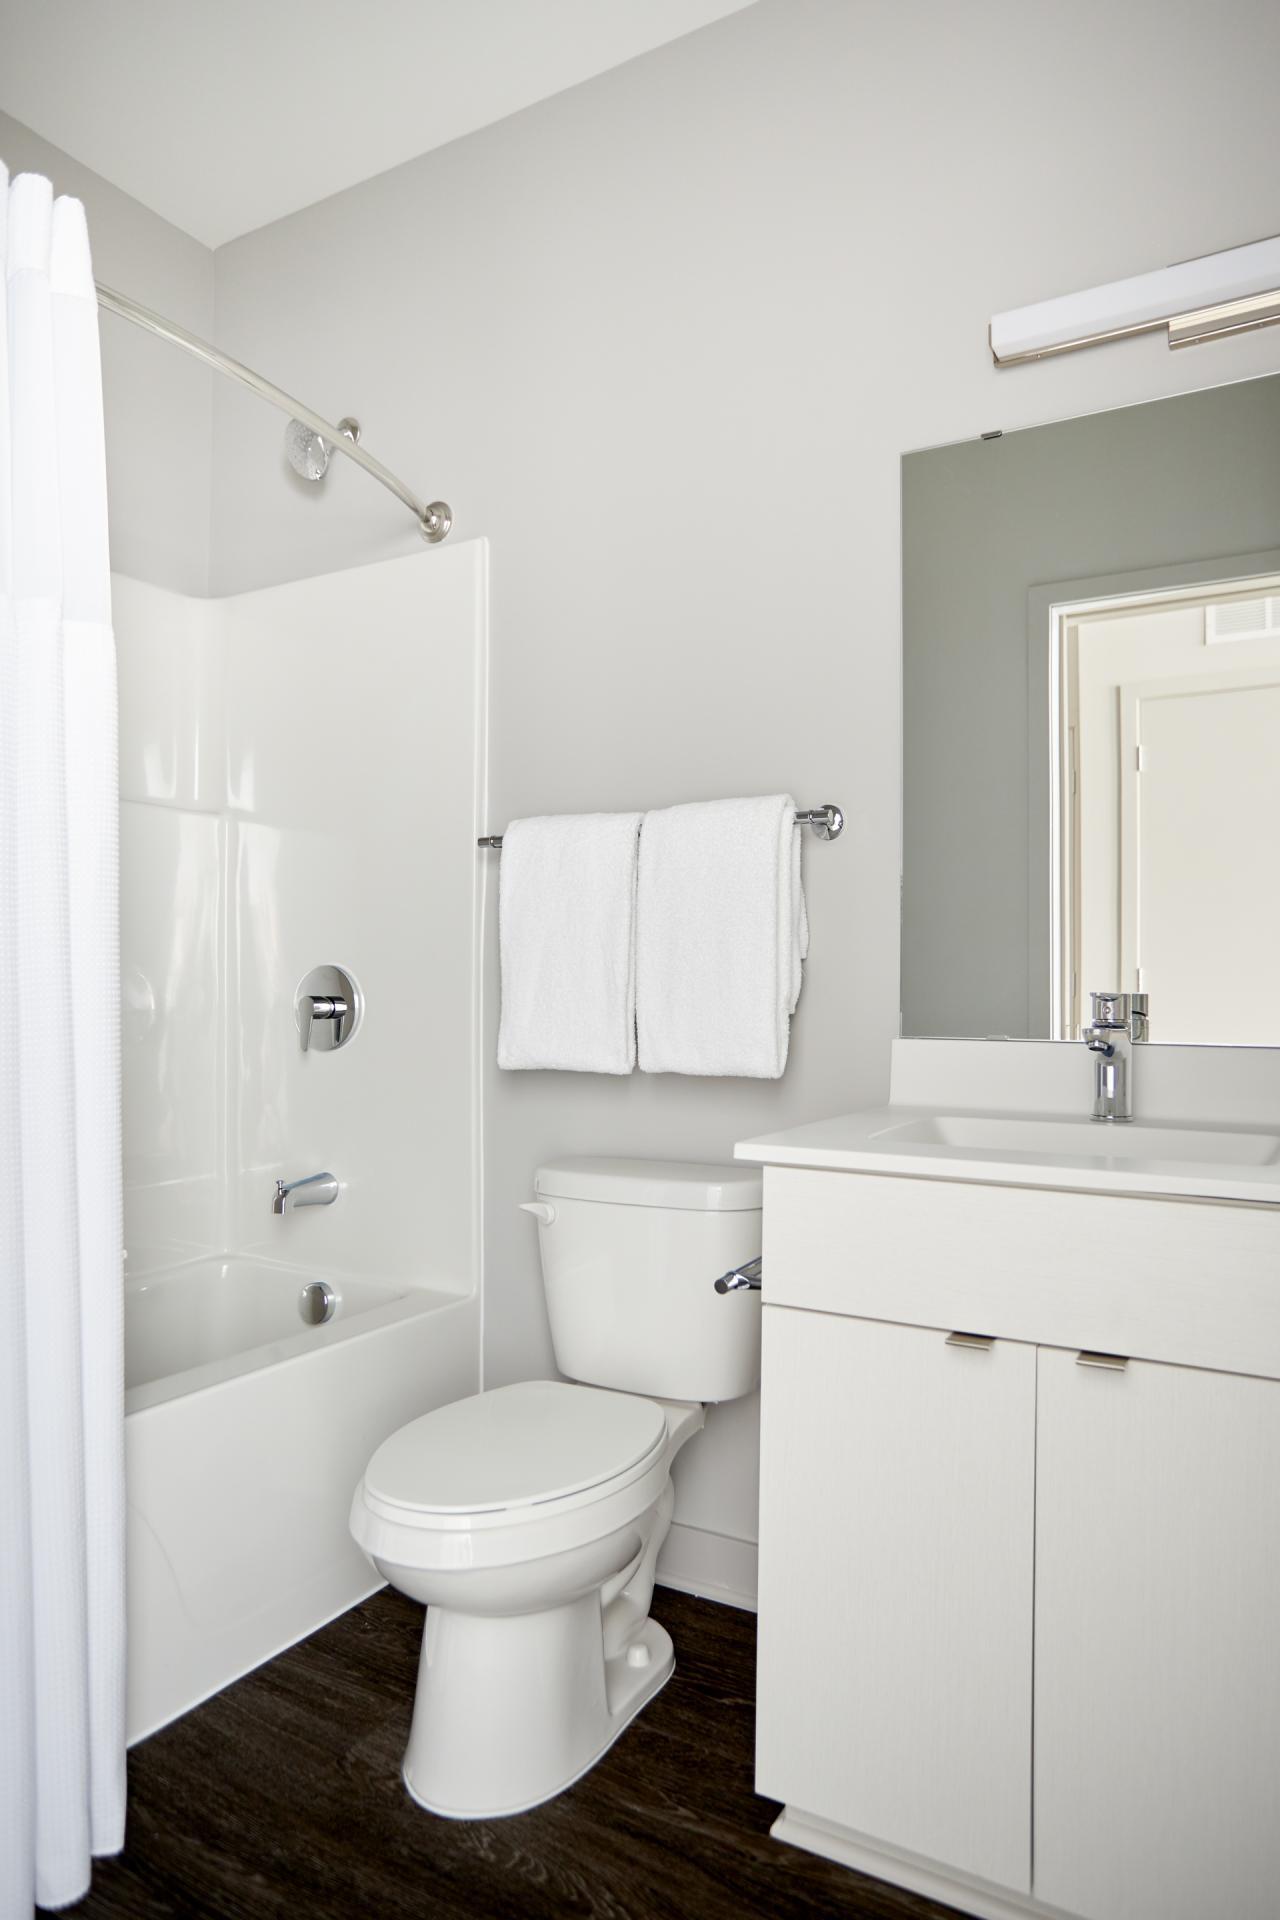 Bathroom at Luna Apartment, Cedar-Riverside, Minneapolis